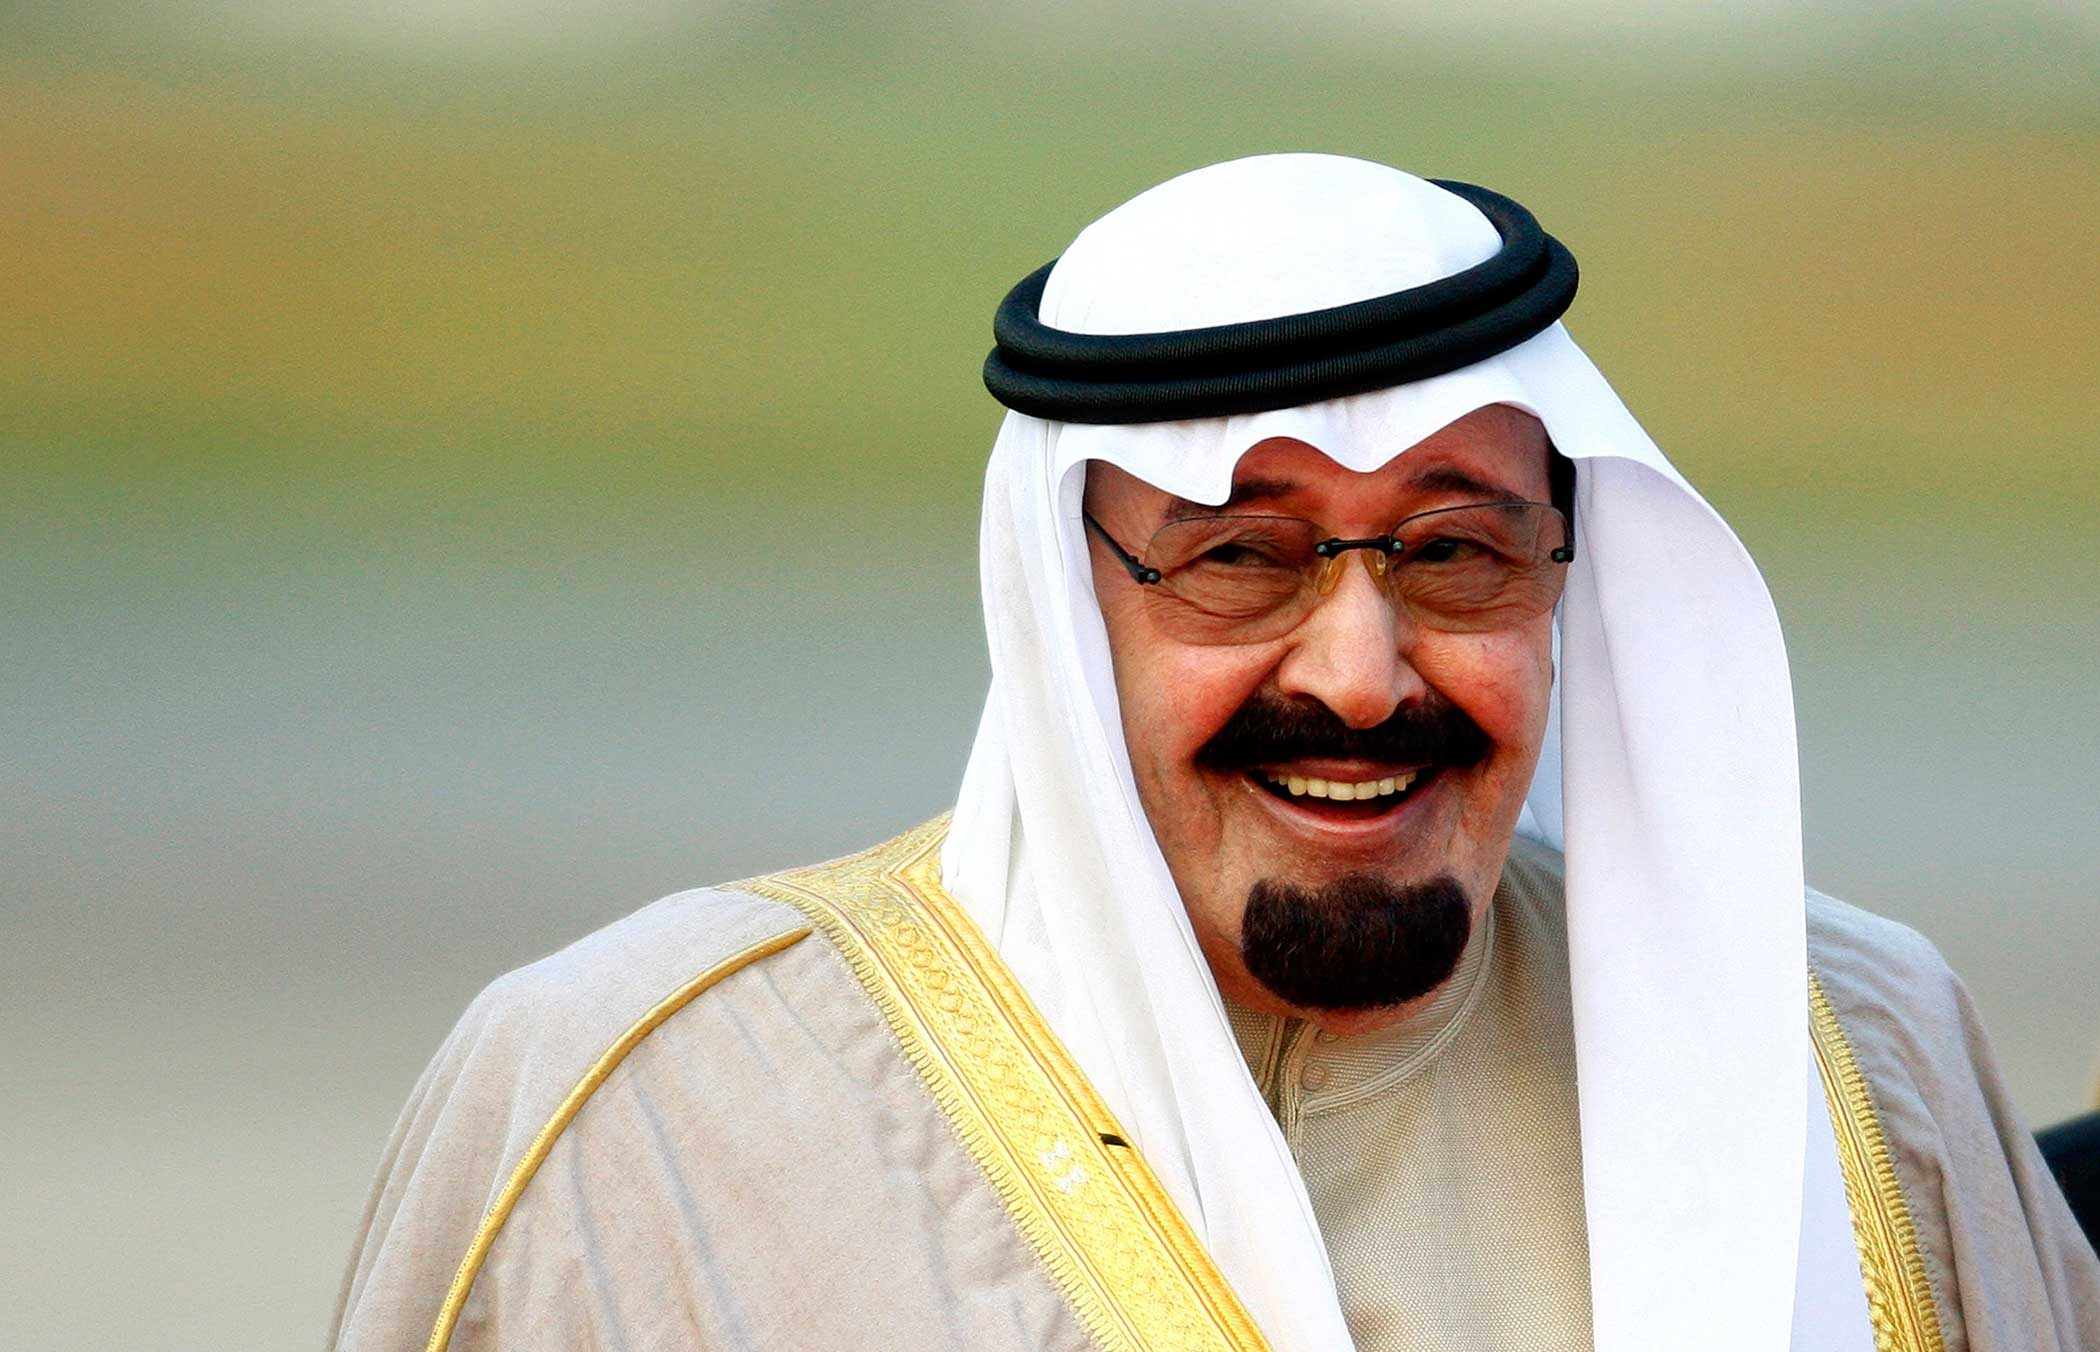 Saudi Arabia's King Abdullah arrives at Heathrow Airport in west London on Oct. 29, 2007.